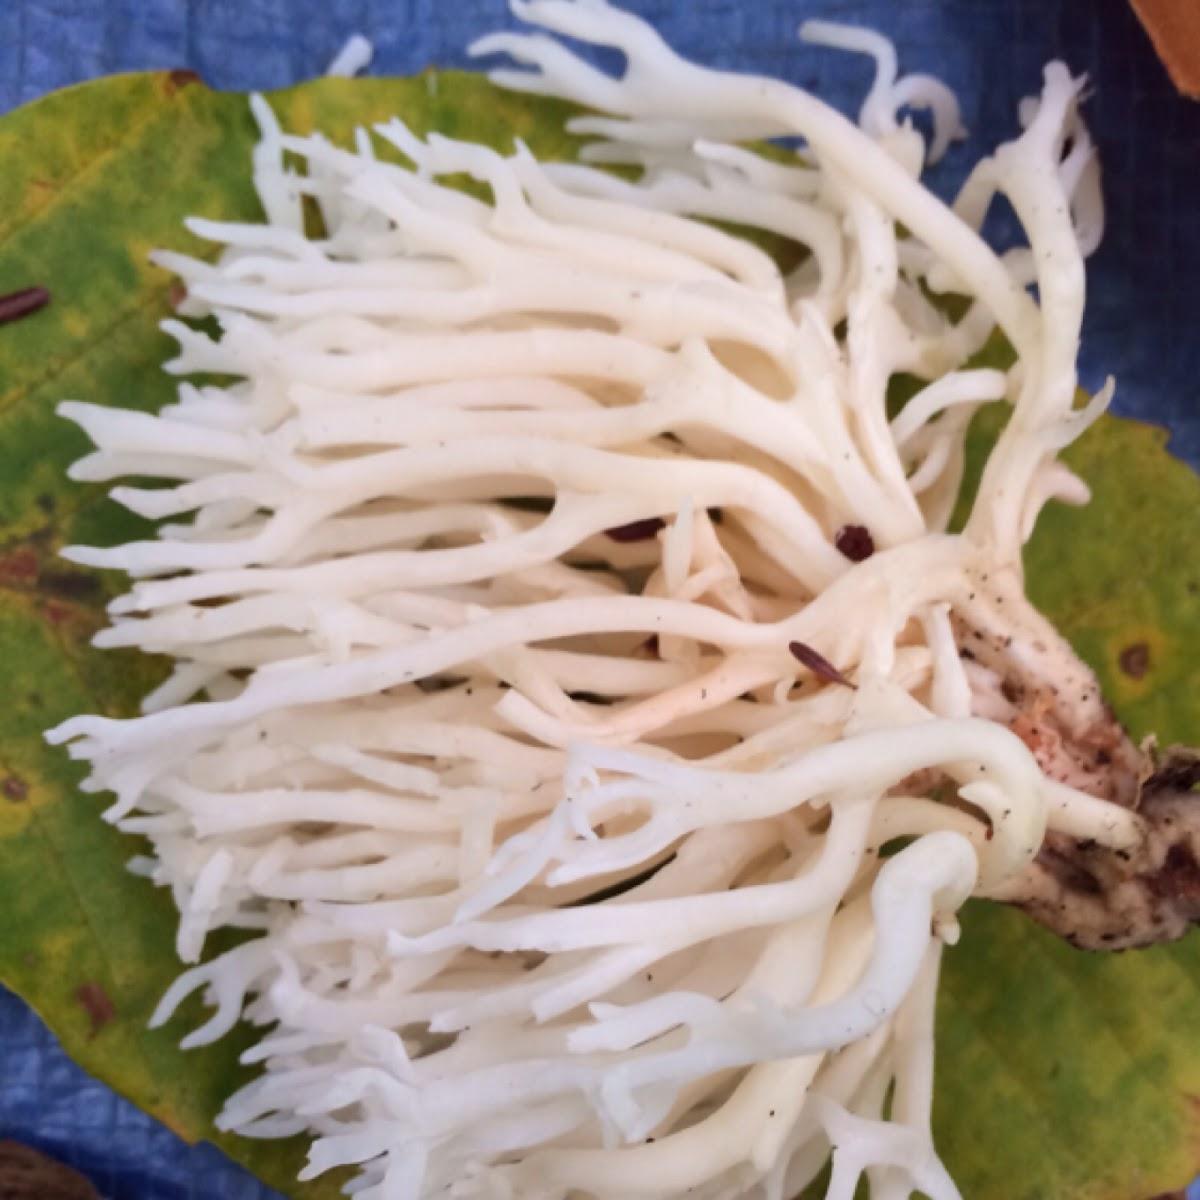 White Coral Fungus